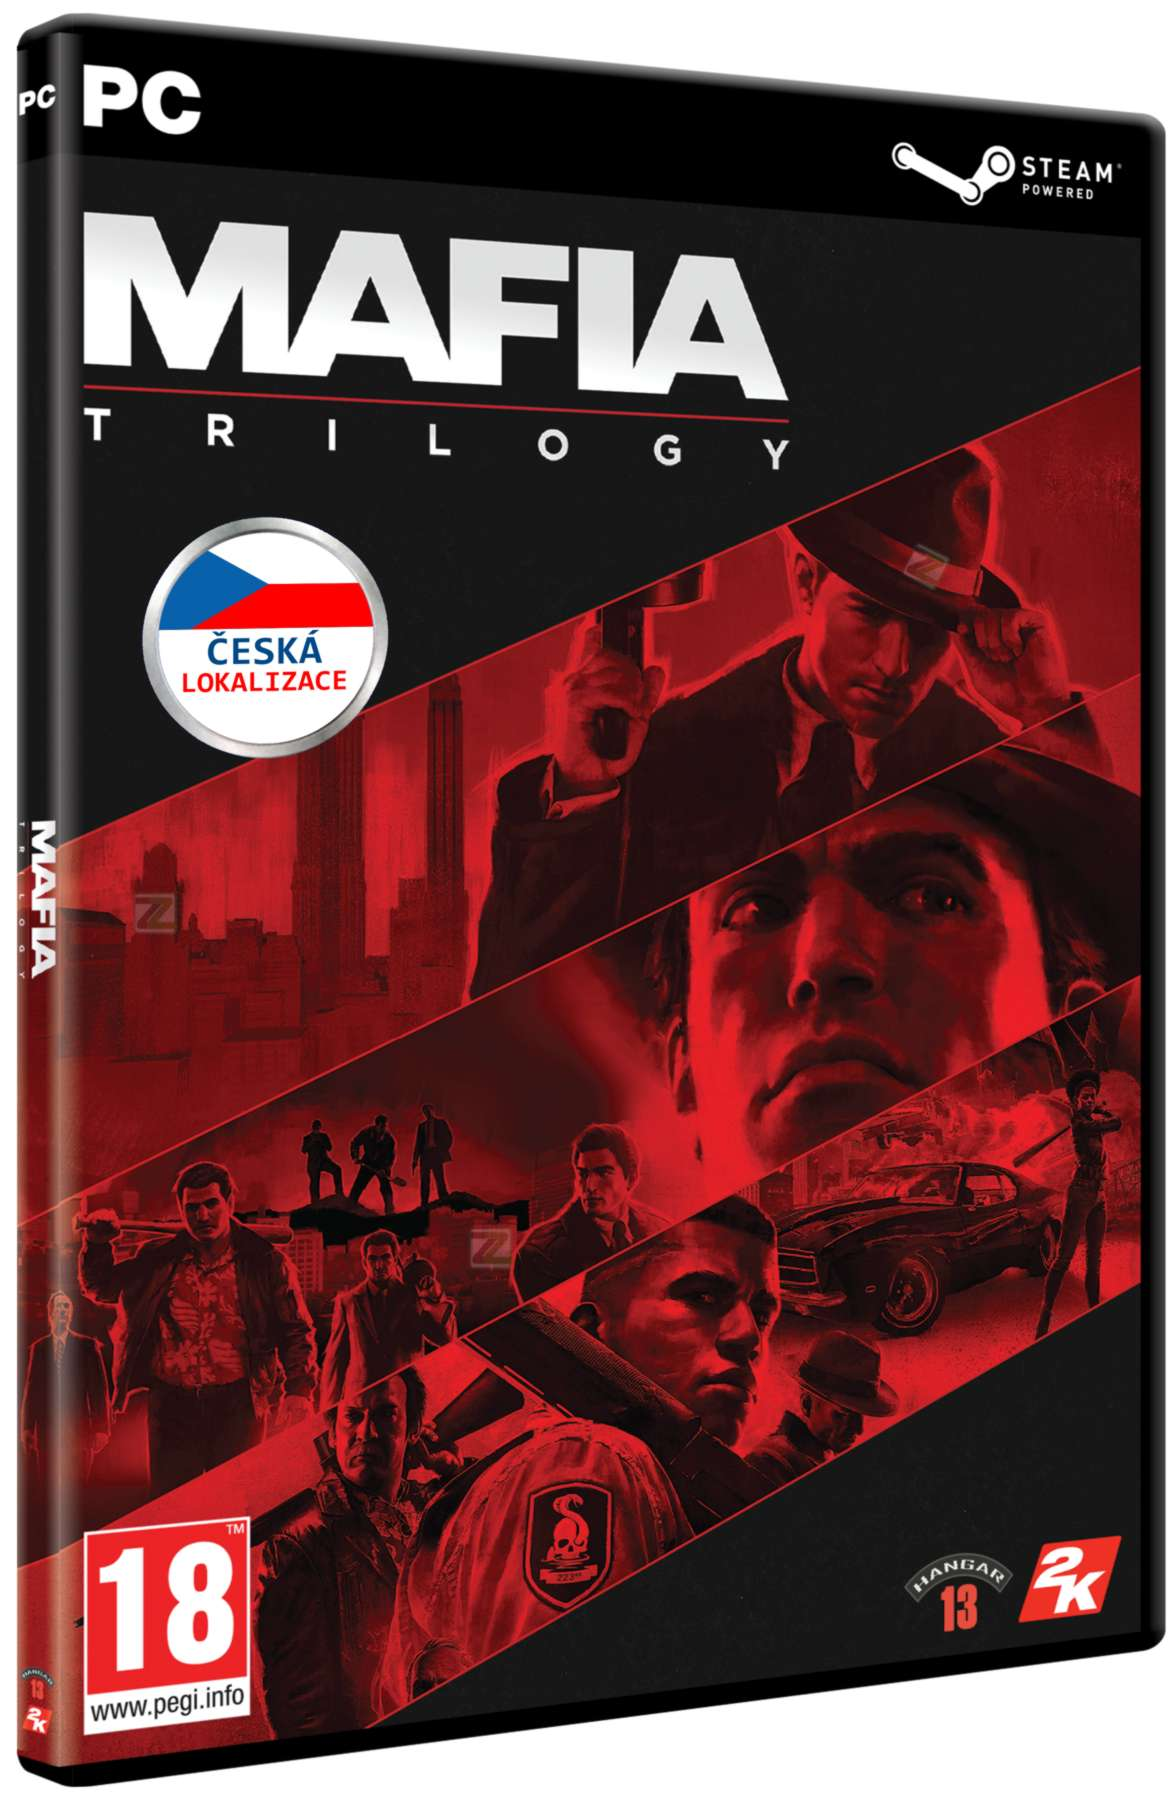 Mafia Trilogy CZ - PC